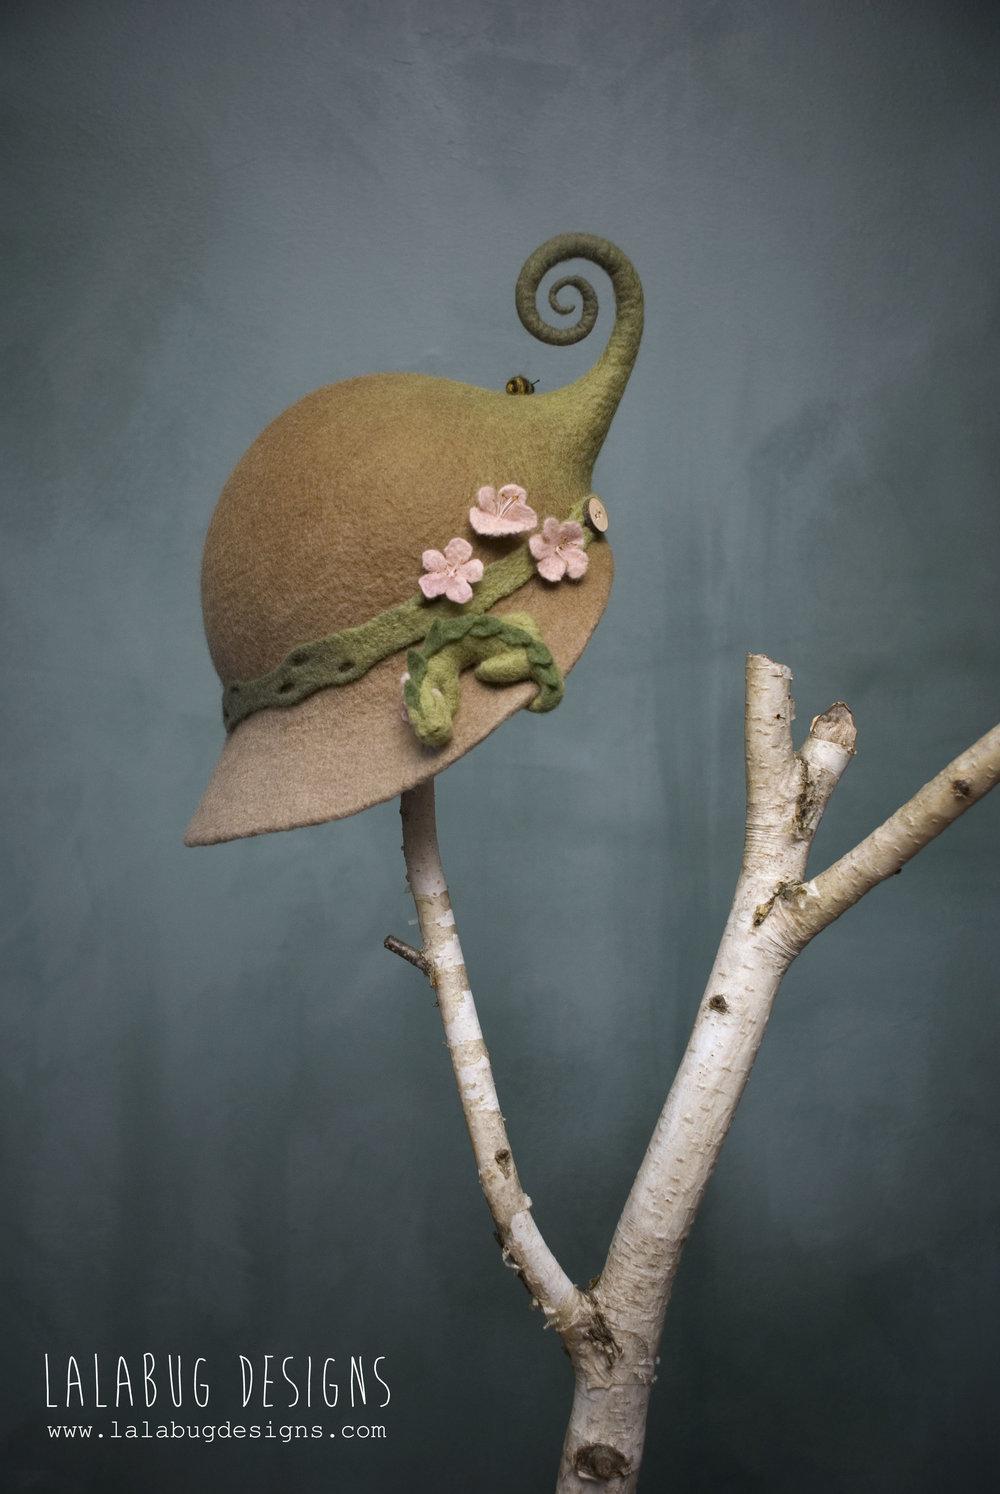 cloche-blossomdragon2.jpg